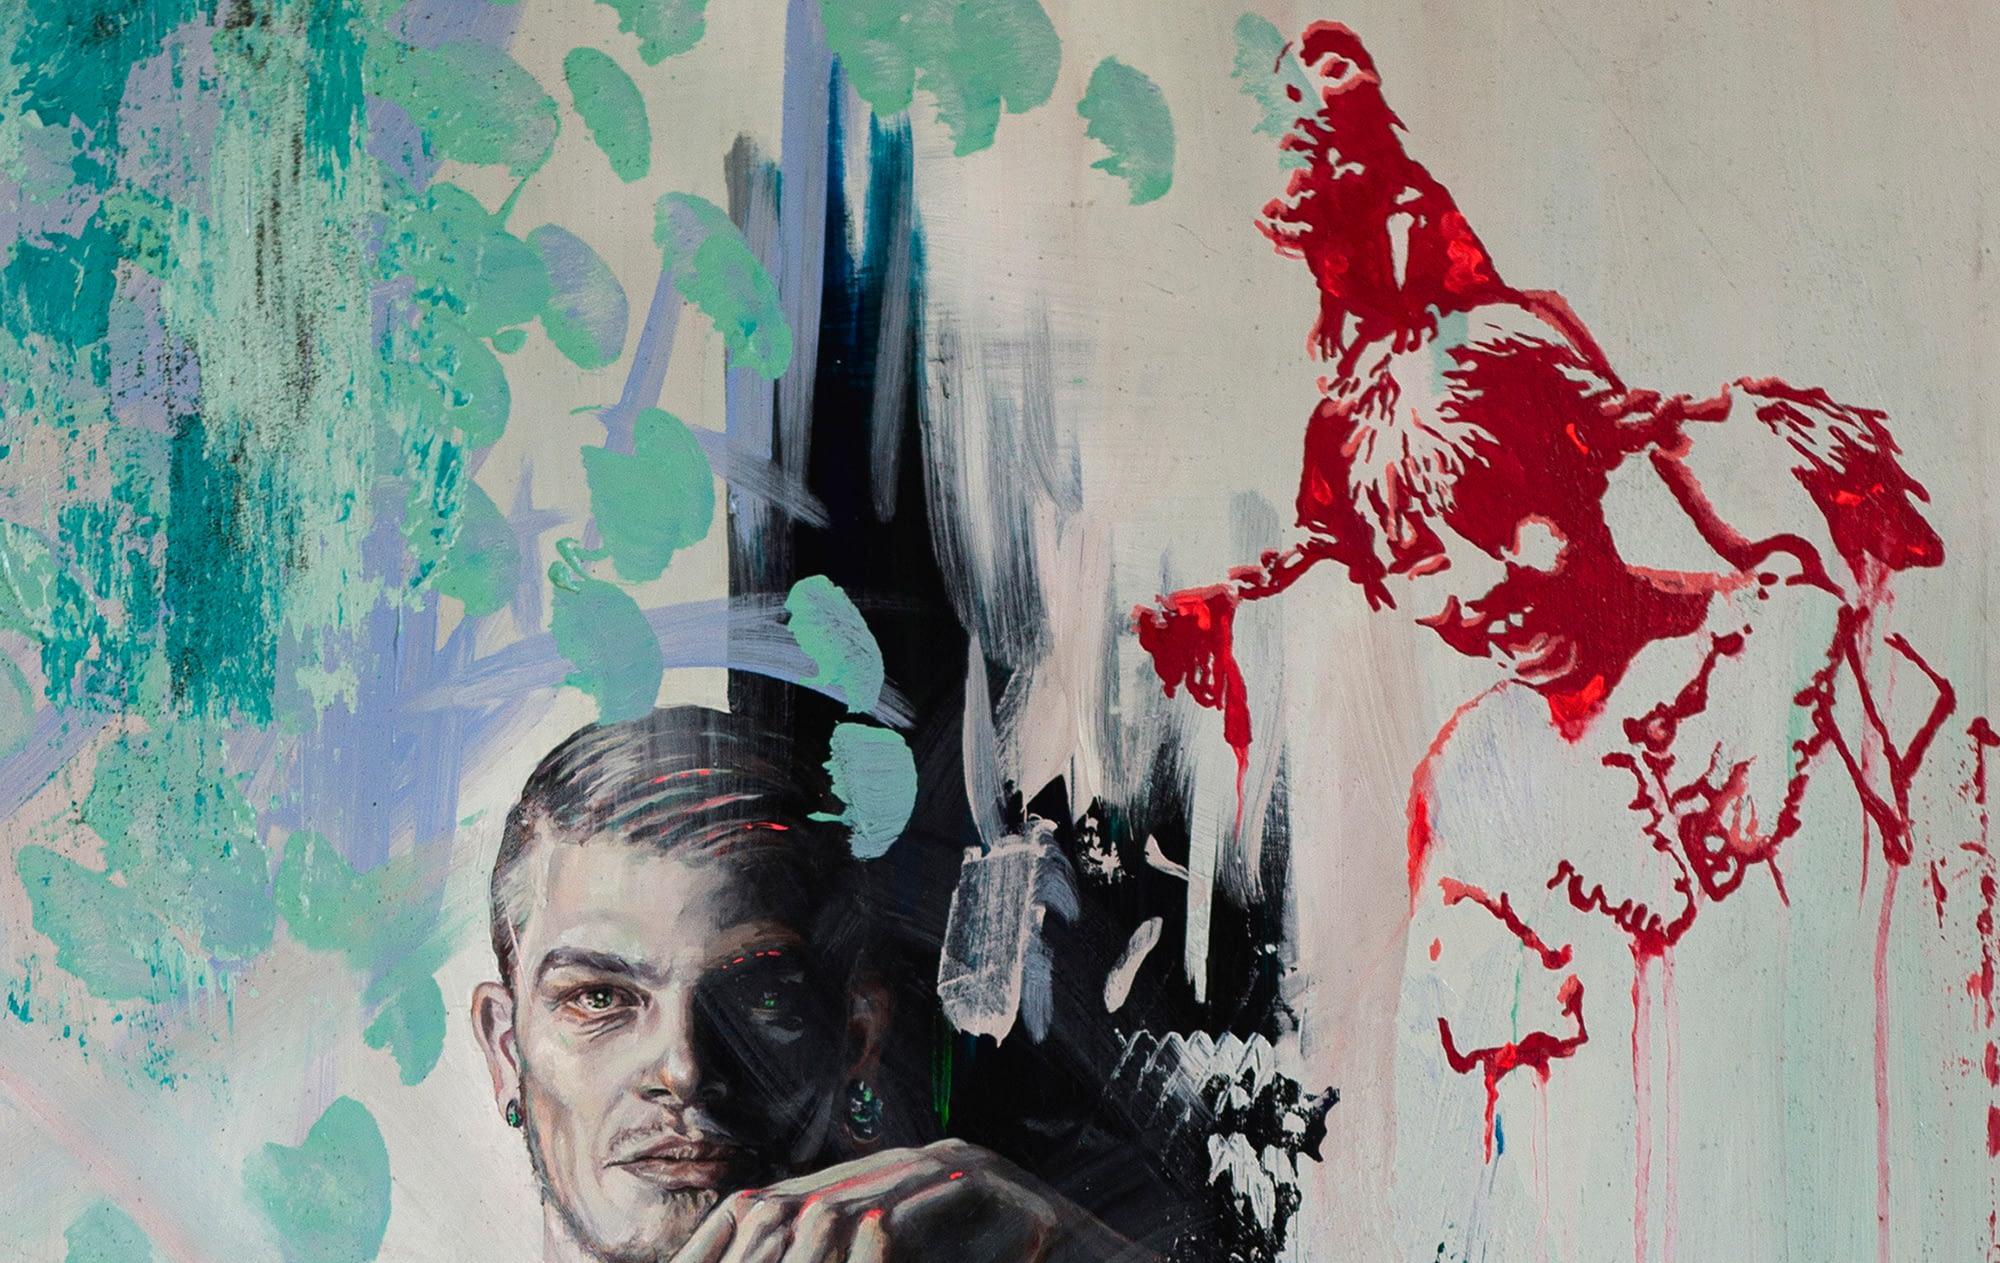 Ute Bescht Kunstwerke: LOVE-POT-PEACE-Pippi Longstocking-BanksyNEW